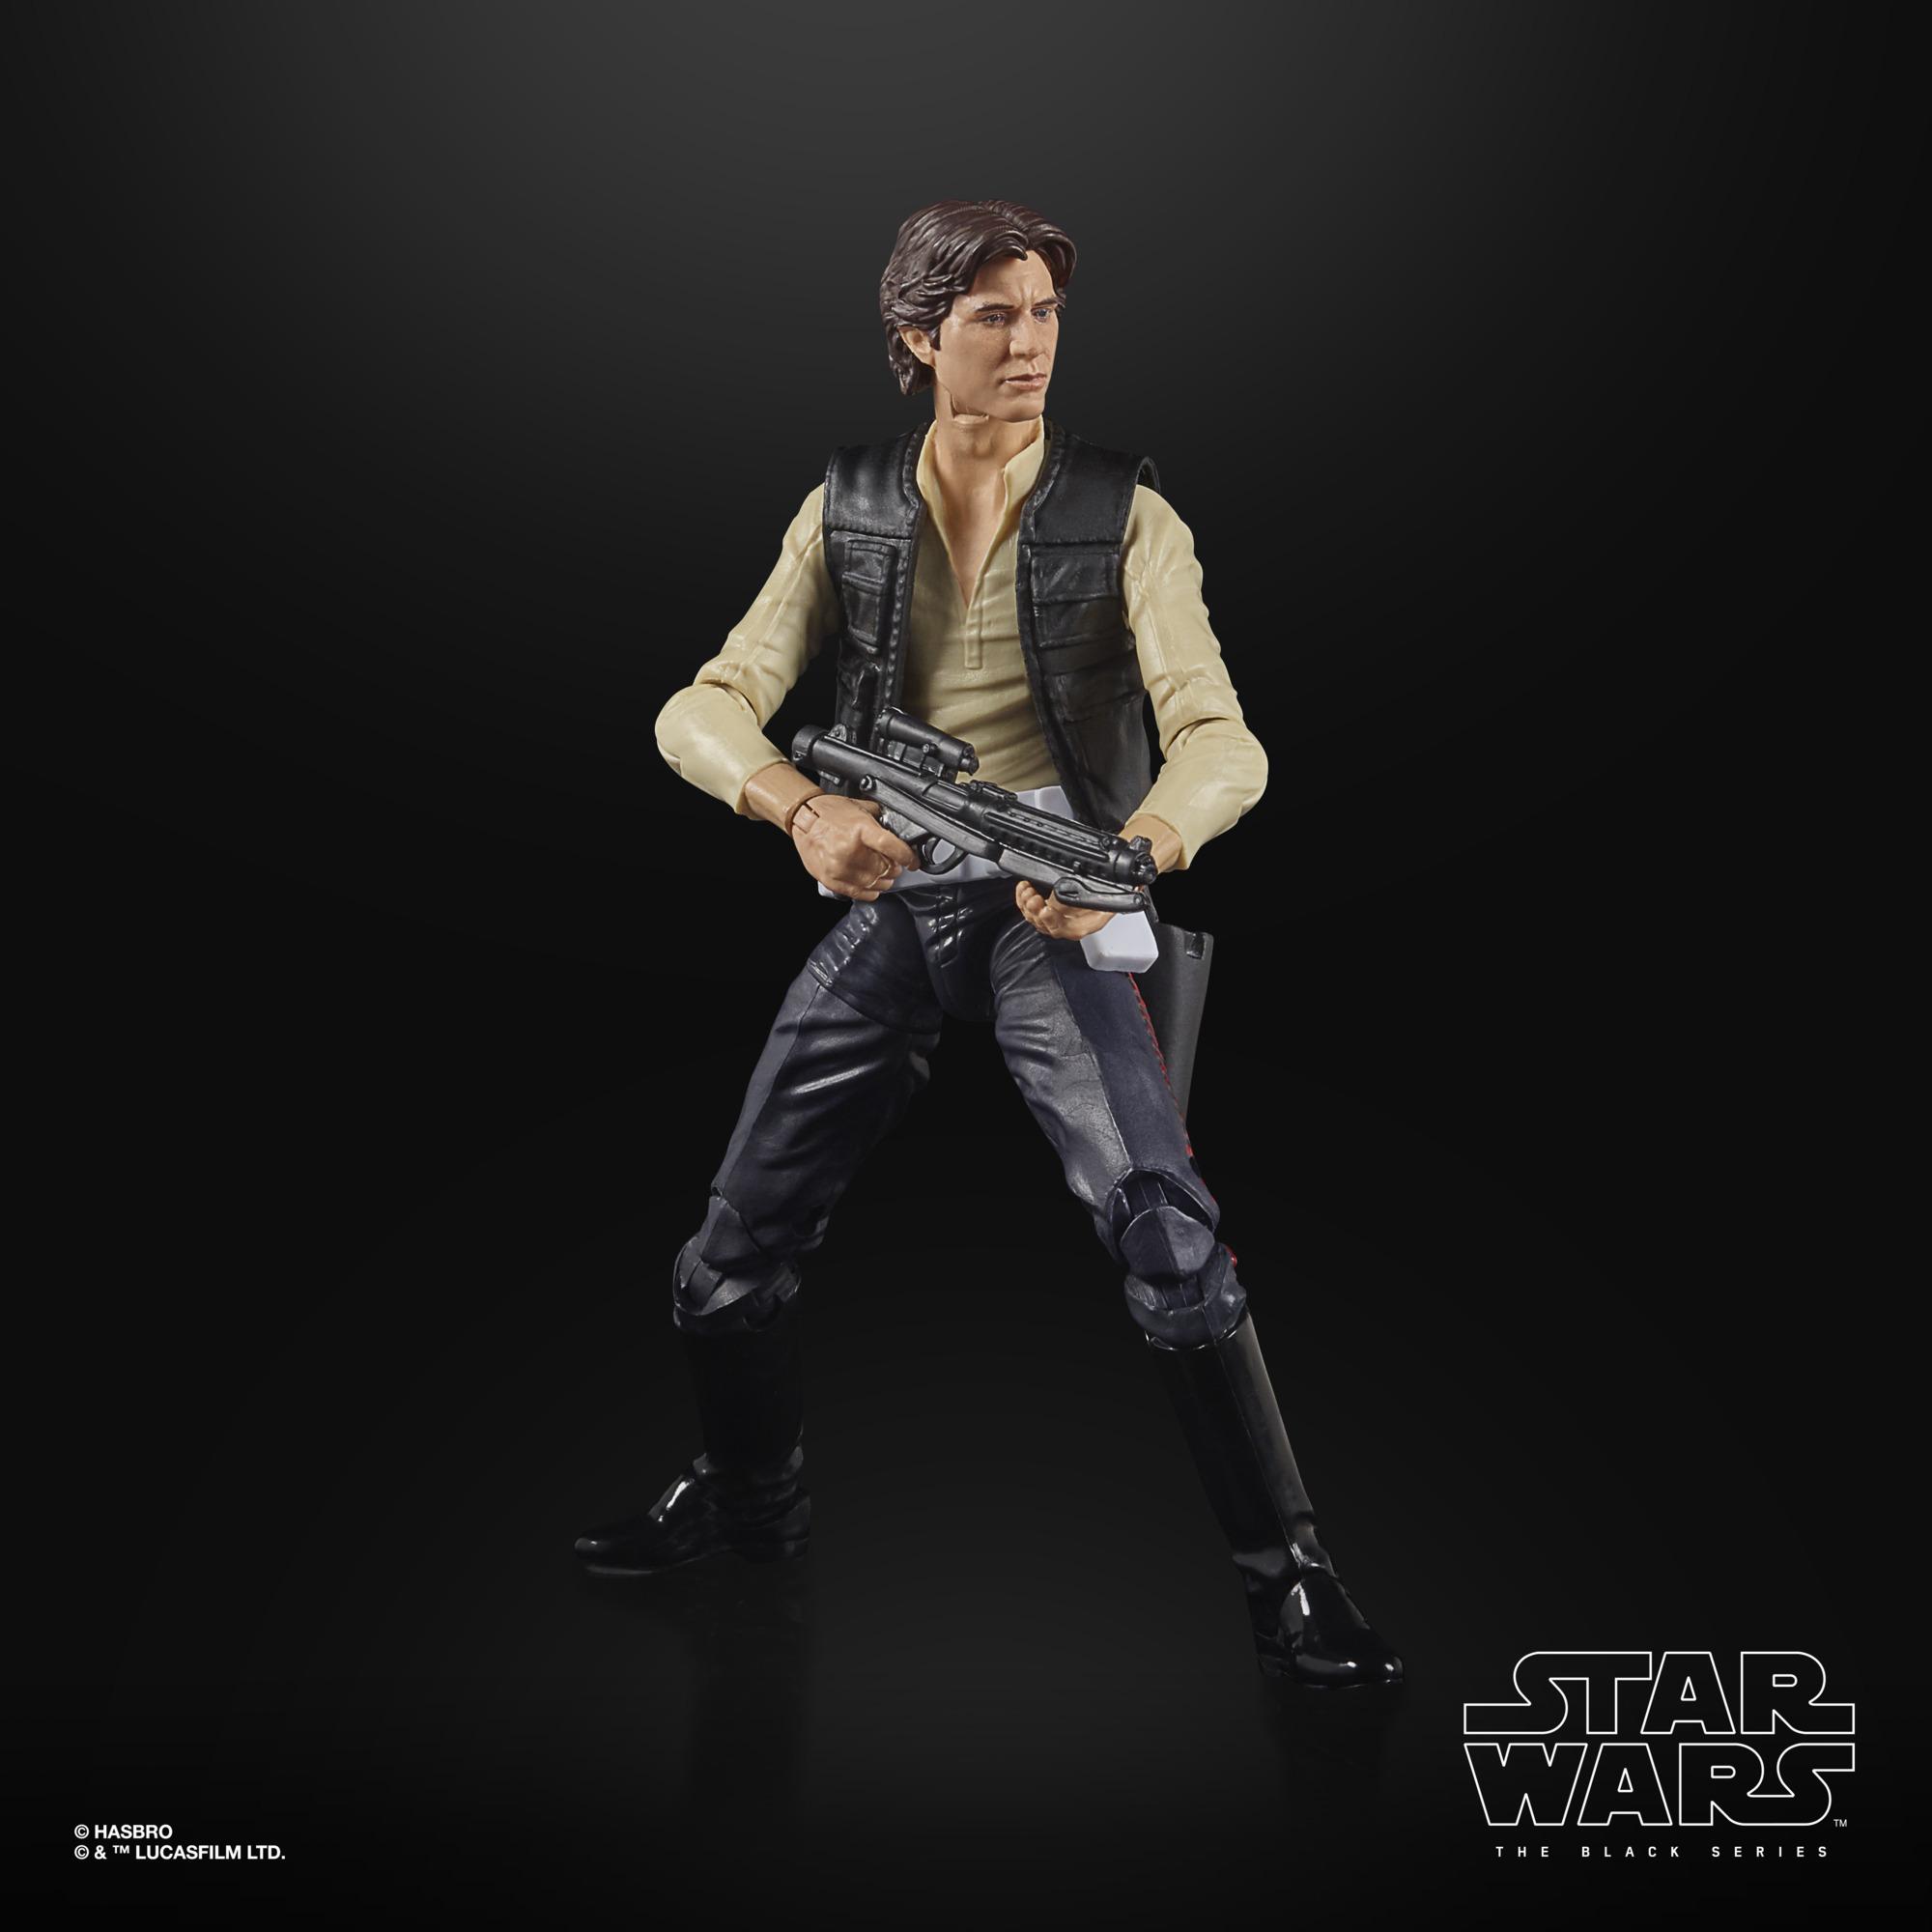 Black-Series-Han-Solo-POTF2-Lucasfilm-50th-Anniversary-Loose-4.jpg